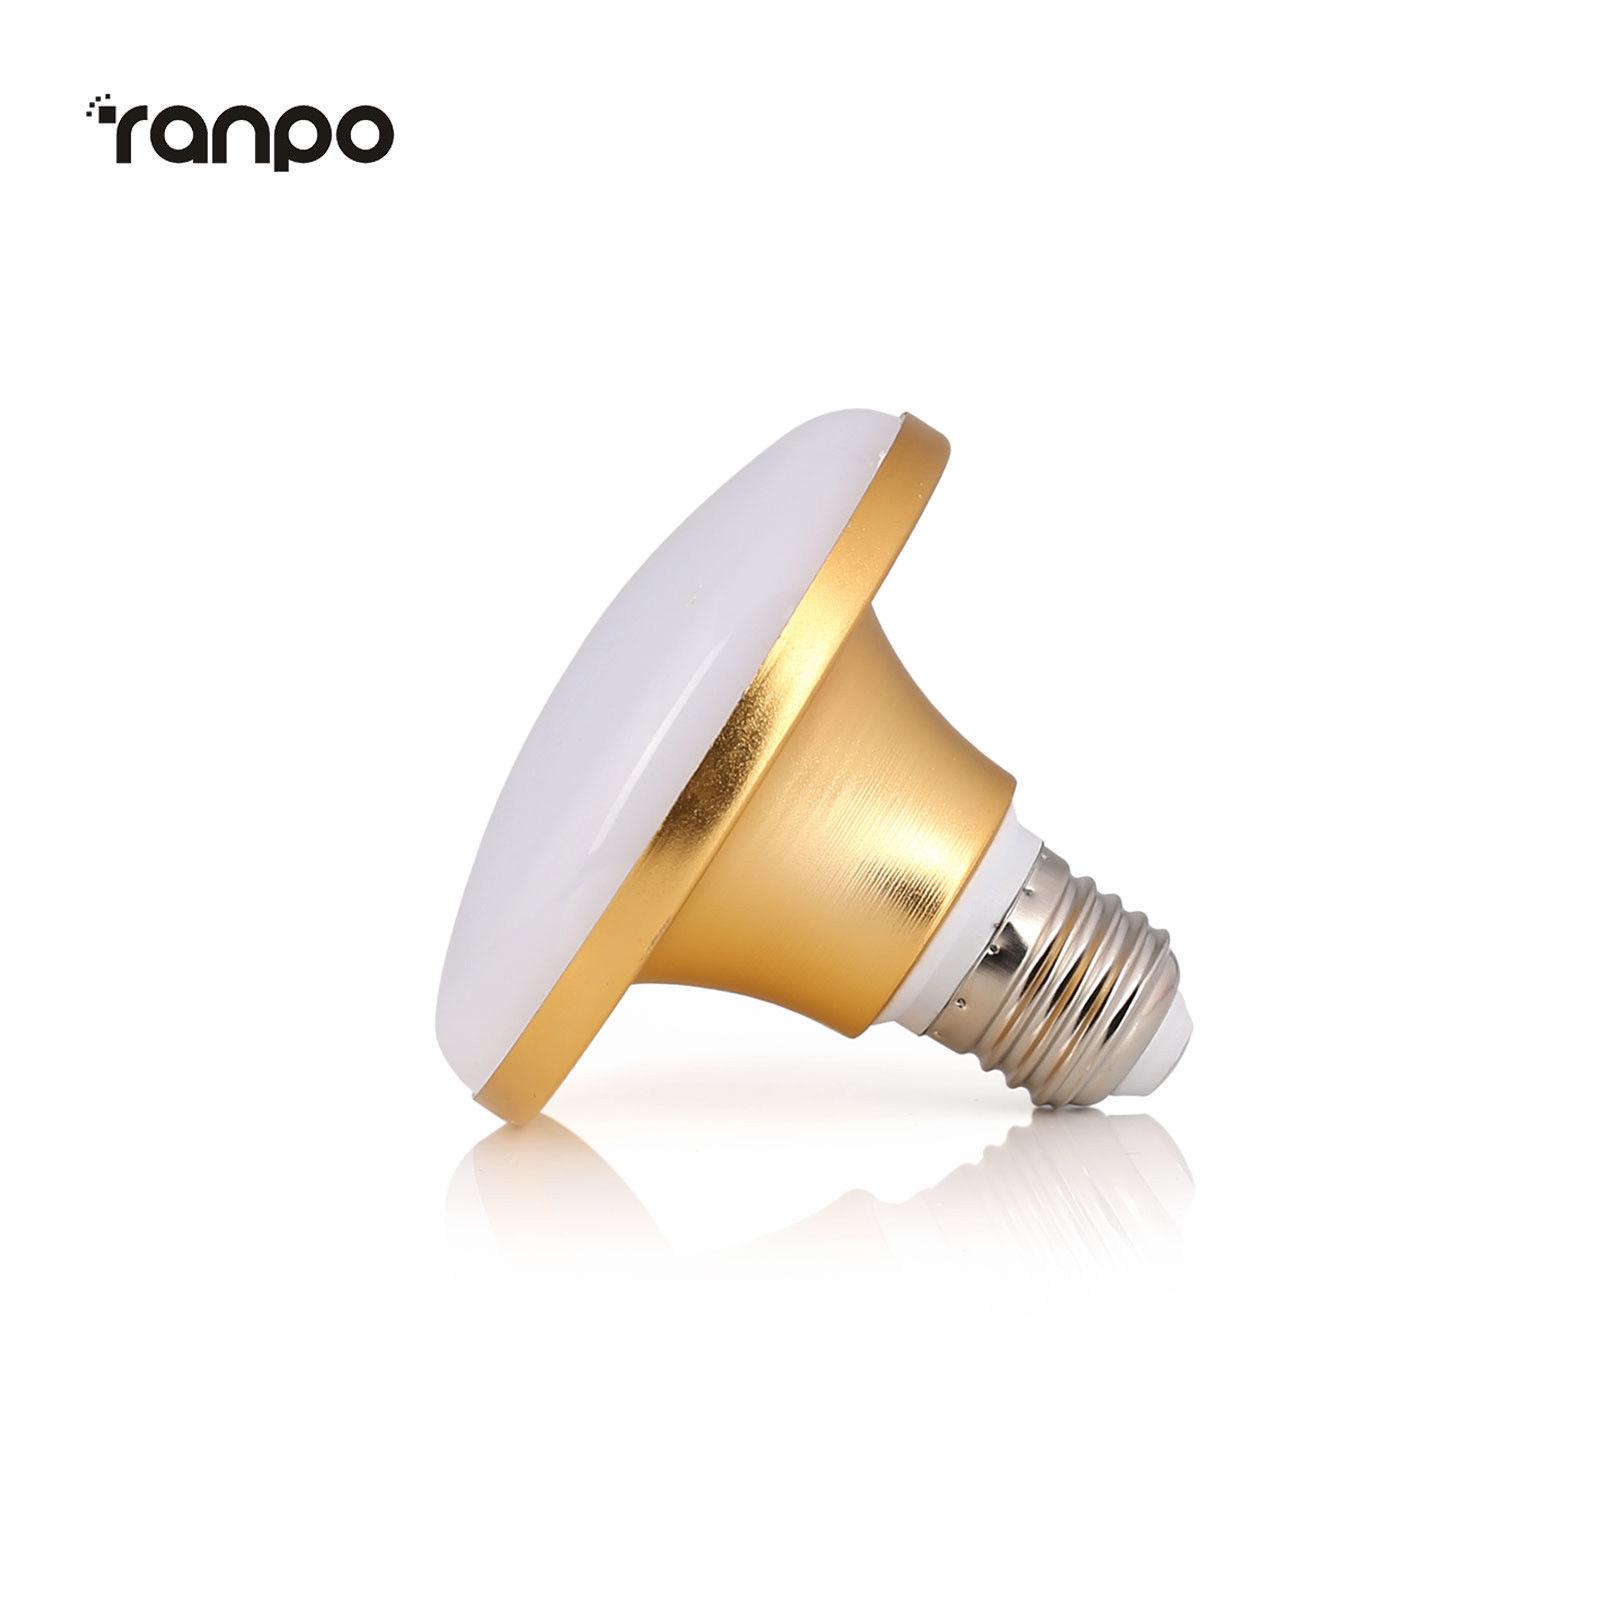 E27 Led Spot Light Ufo Globe Round Bulb 15W 20W Brights Lamps 220V Home WG